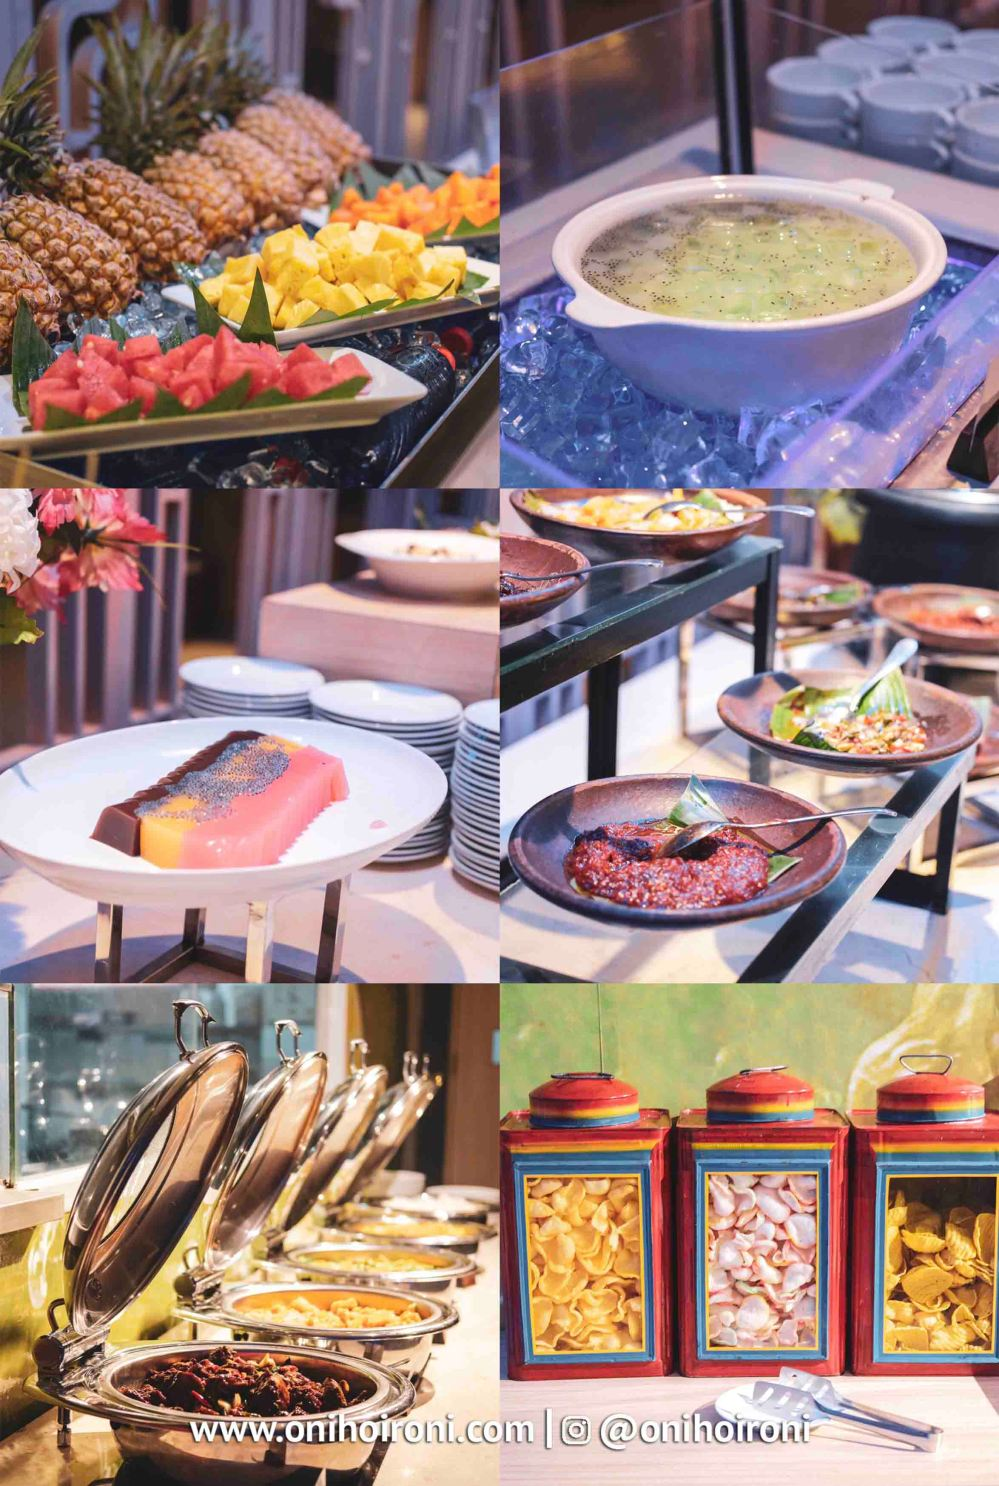 Buffet Lime Restaurant Fave Hotel palembang Oni Hoironi